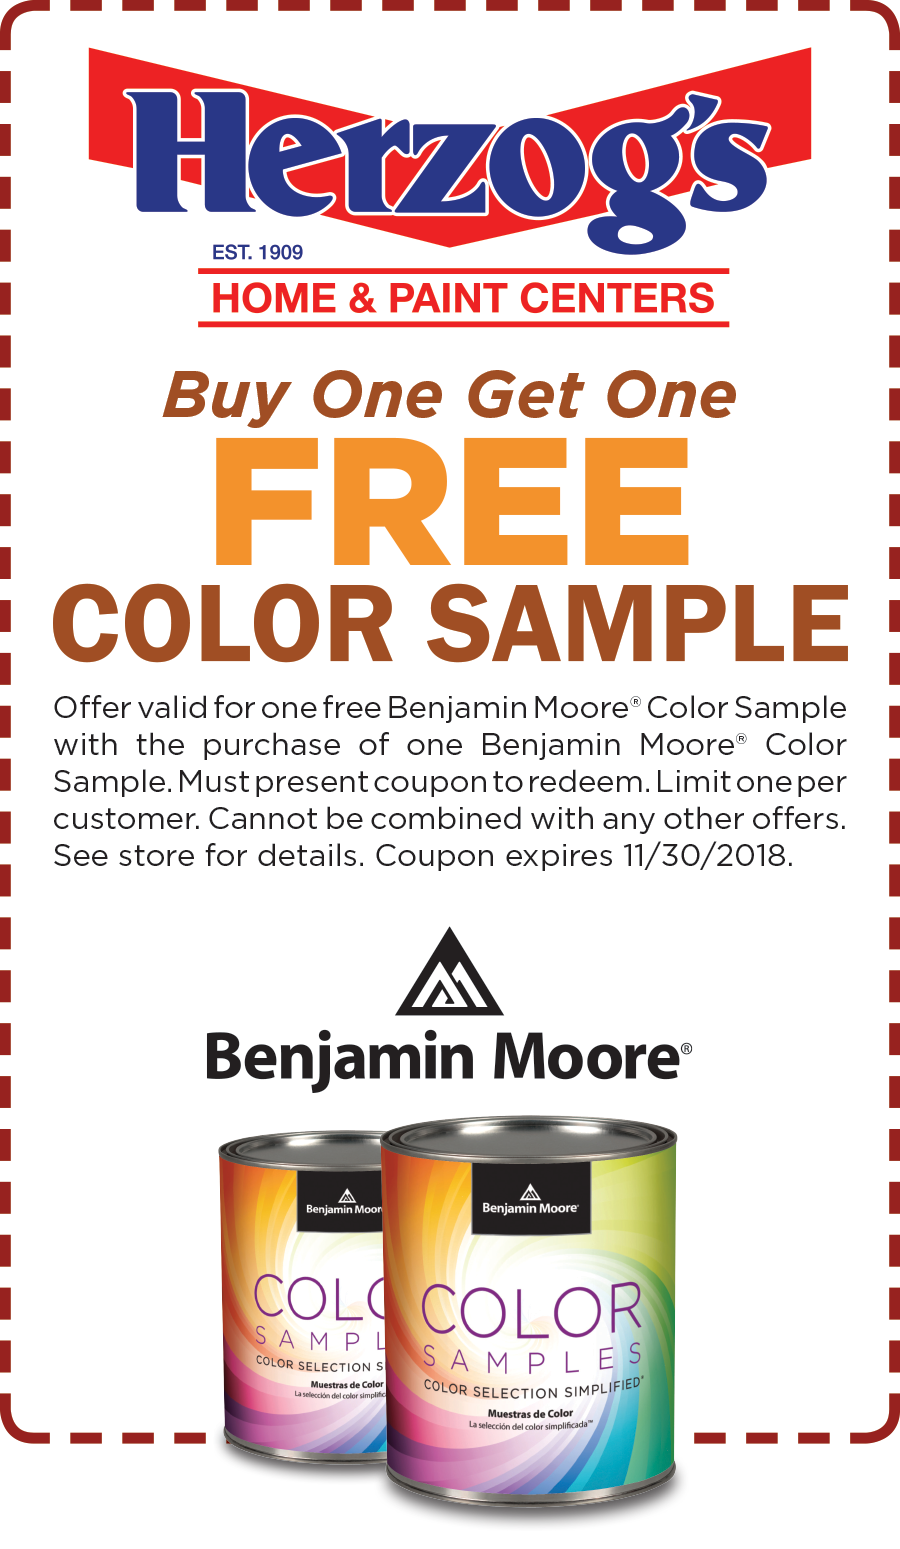 Buy one get one FREE Color Sample of Benjamin Moore Paint